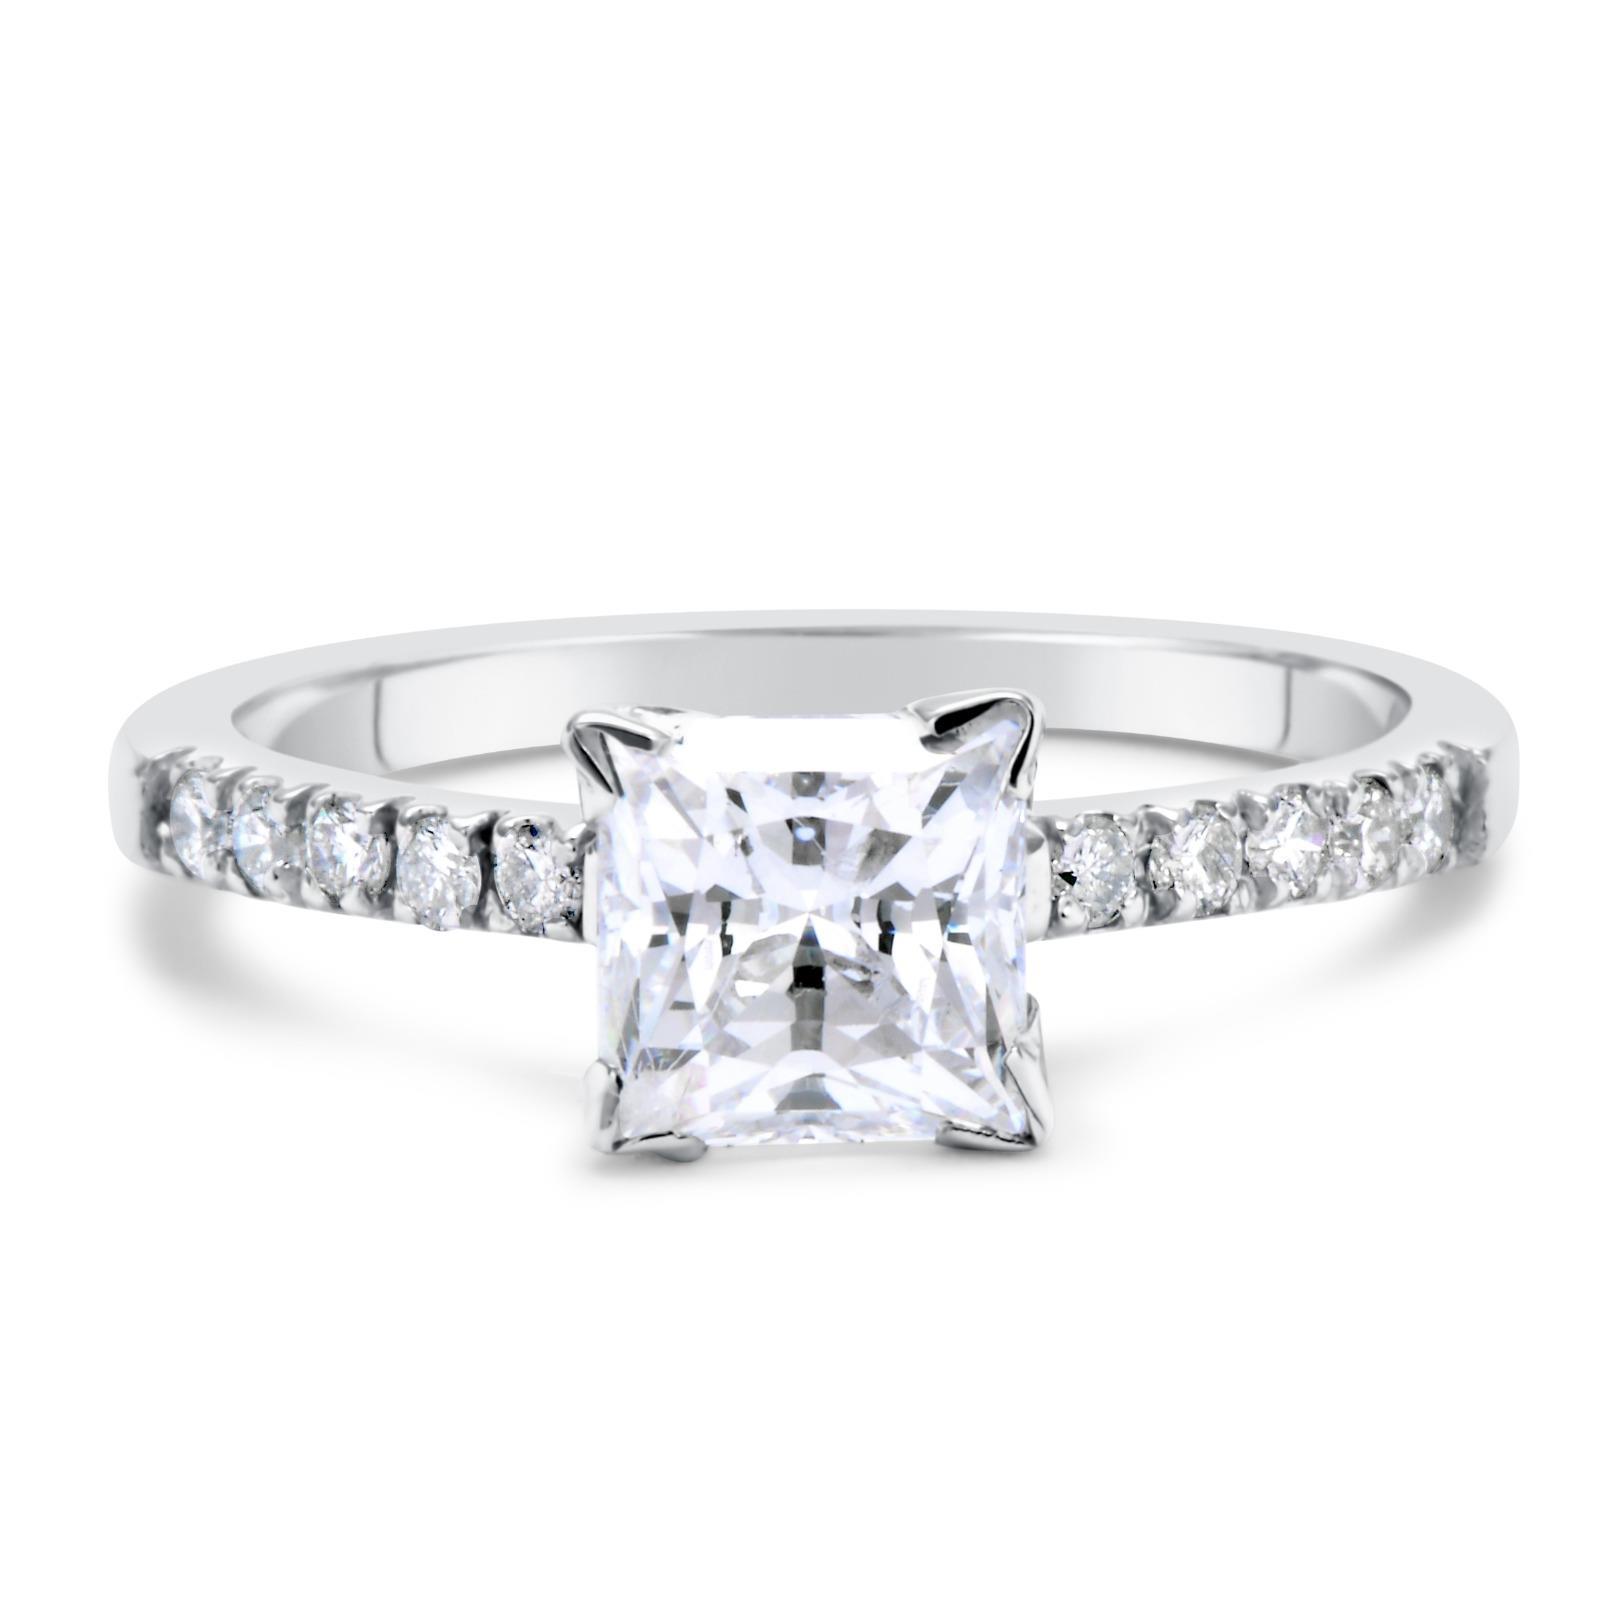 1 5 ct si1 d princess cut engagement ring 14k